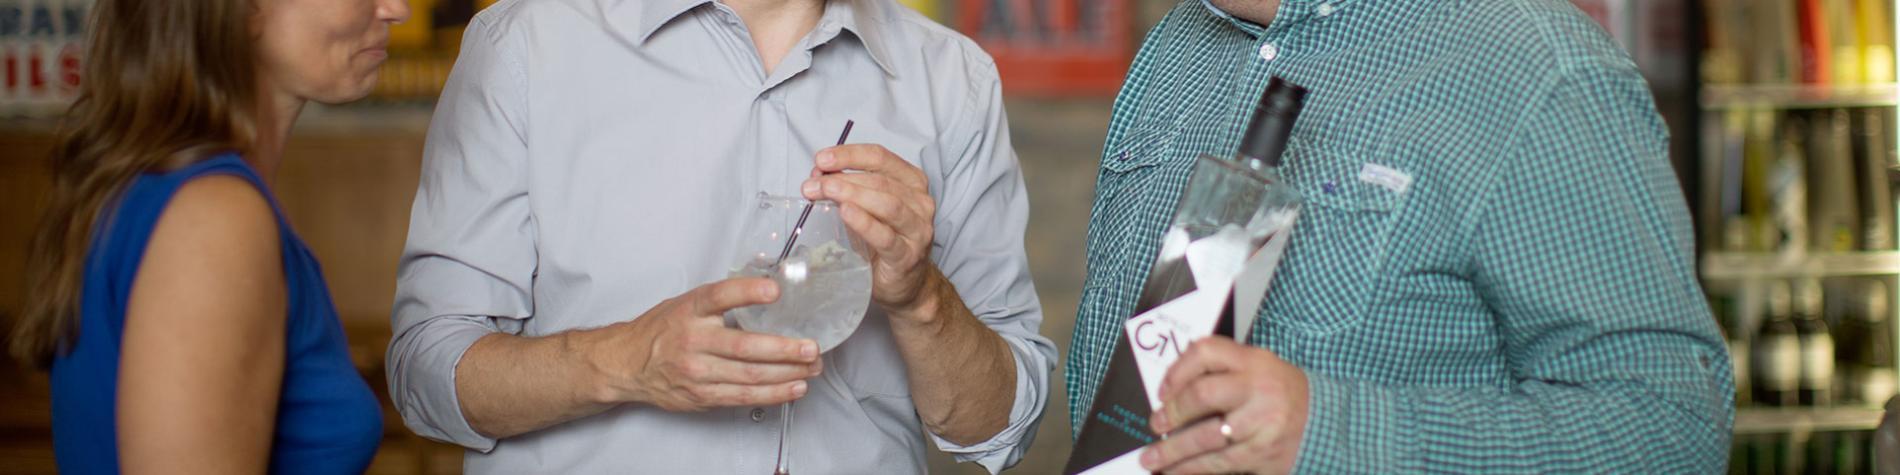 Distillerie - Biercee - gin